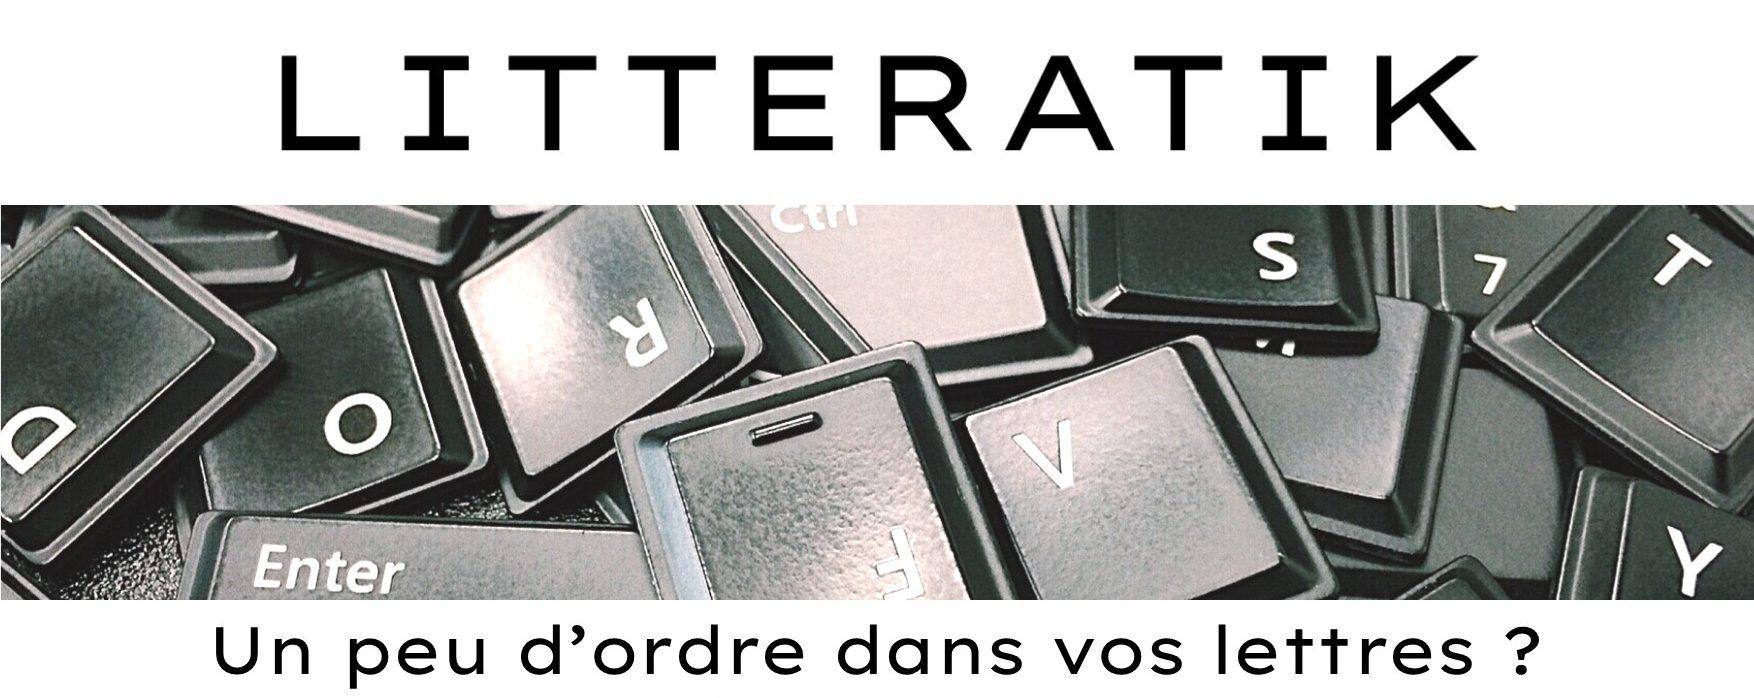 LITTERATIK